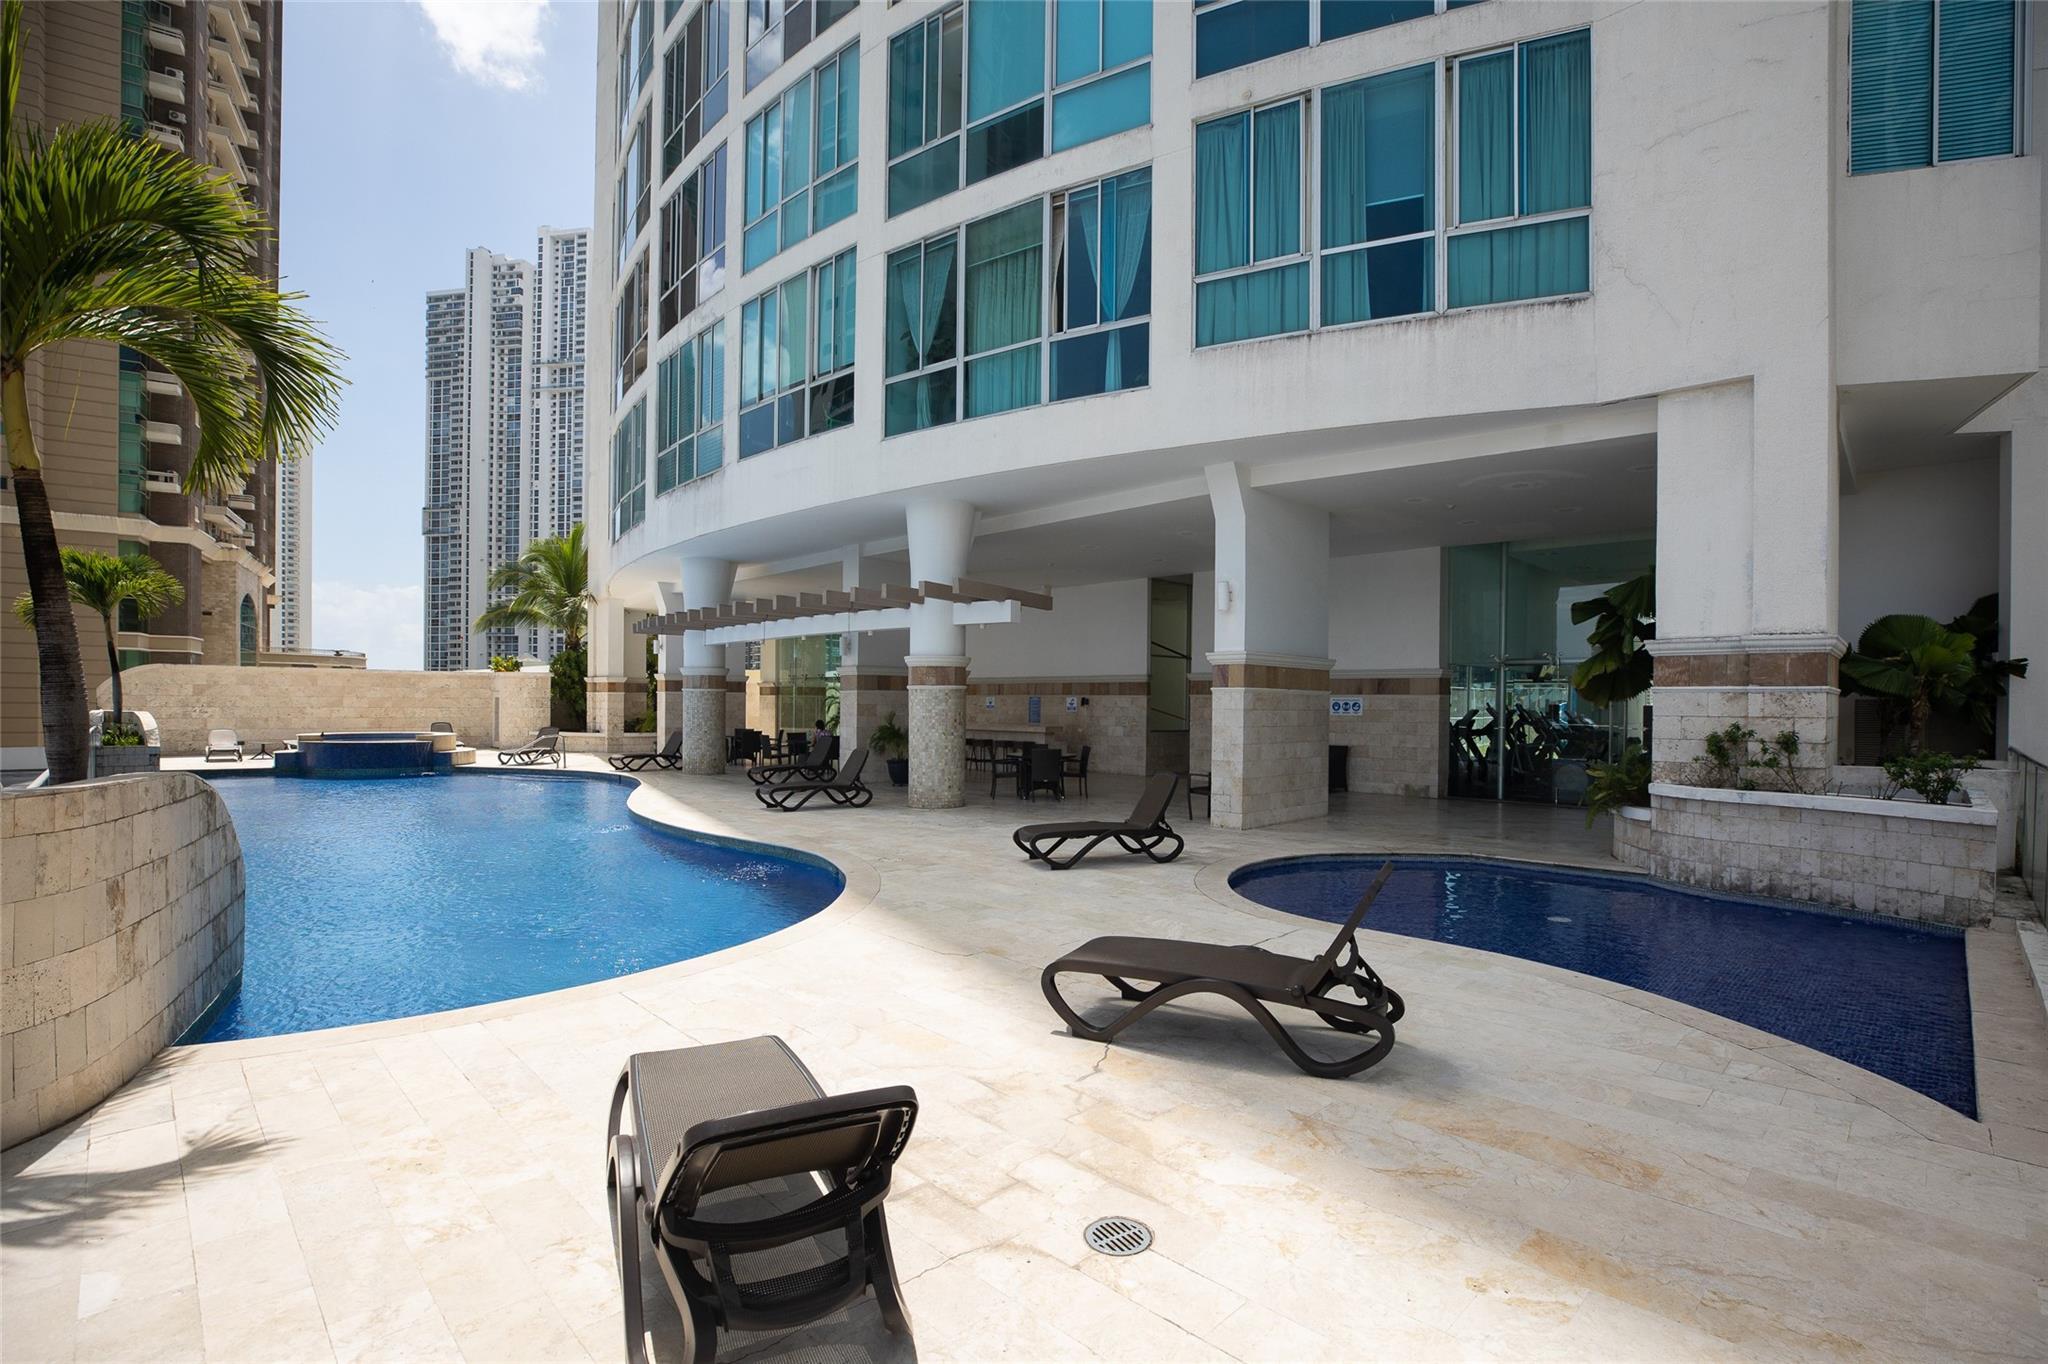 0 PH Blue Bahia #23 N Property Photo - Panama City, real estate listing